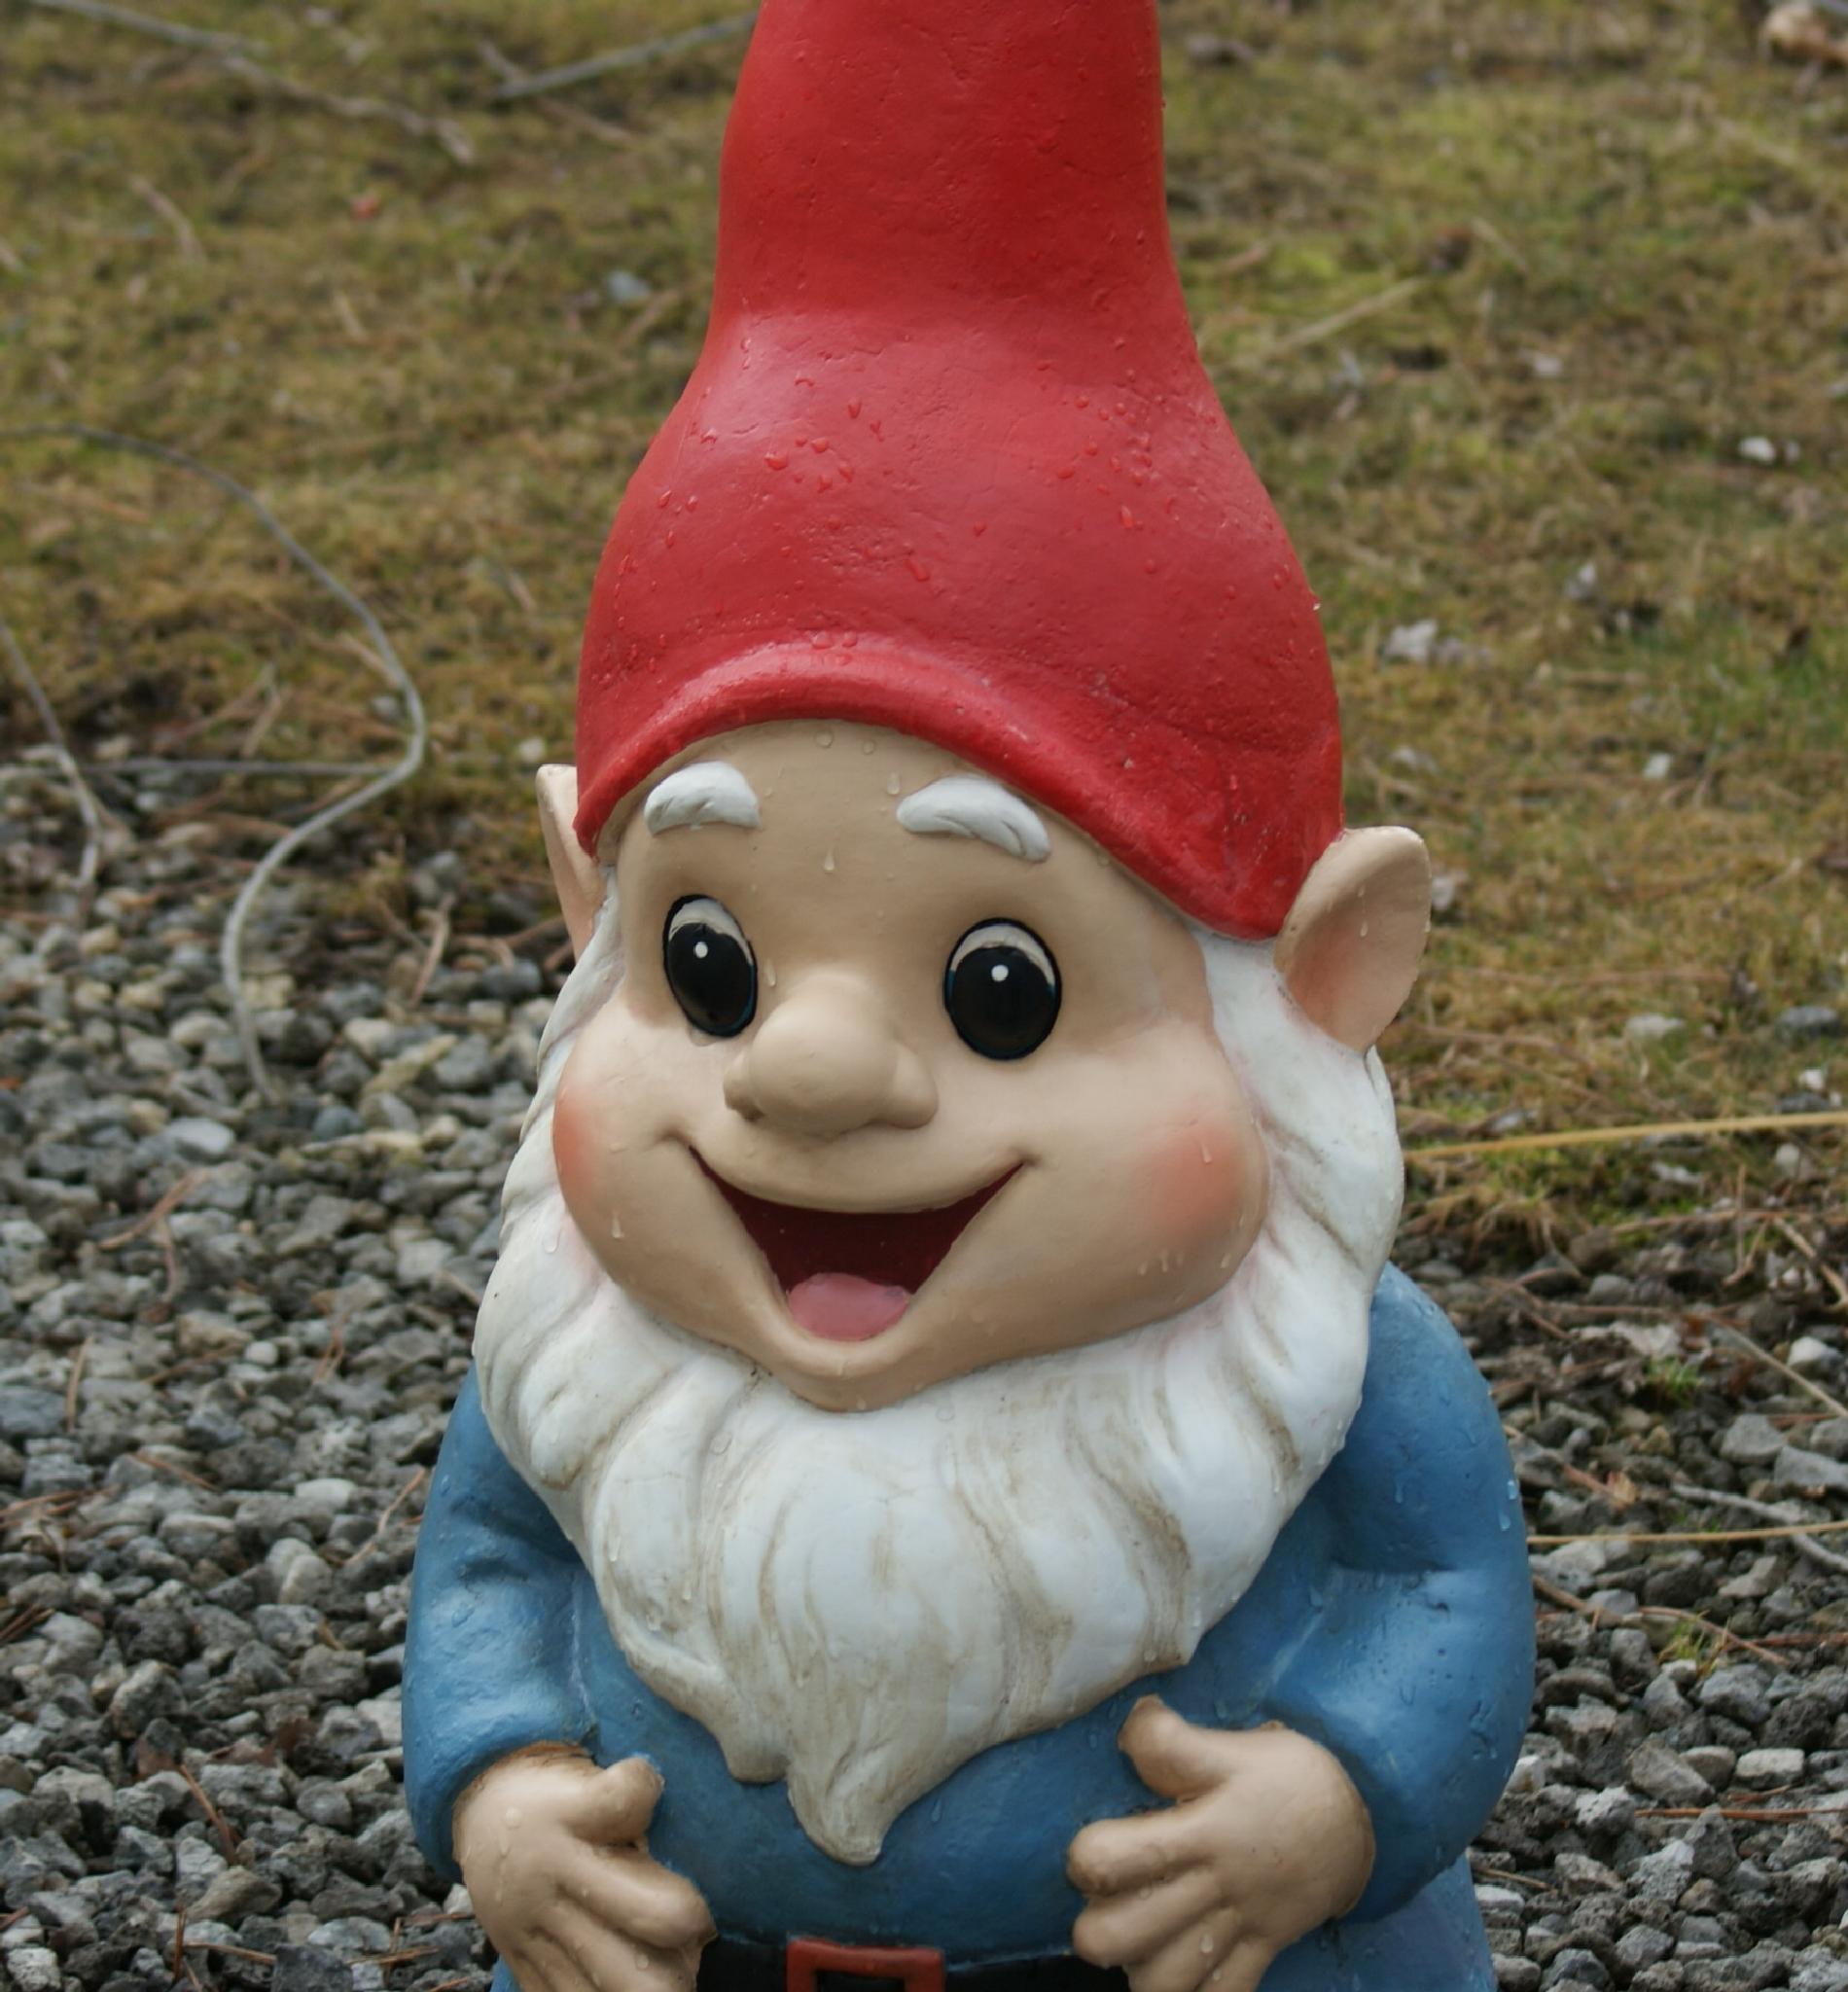 Gnome by Darlene Pavek